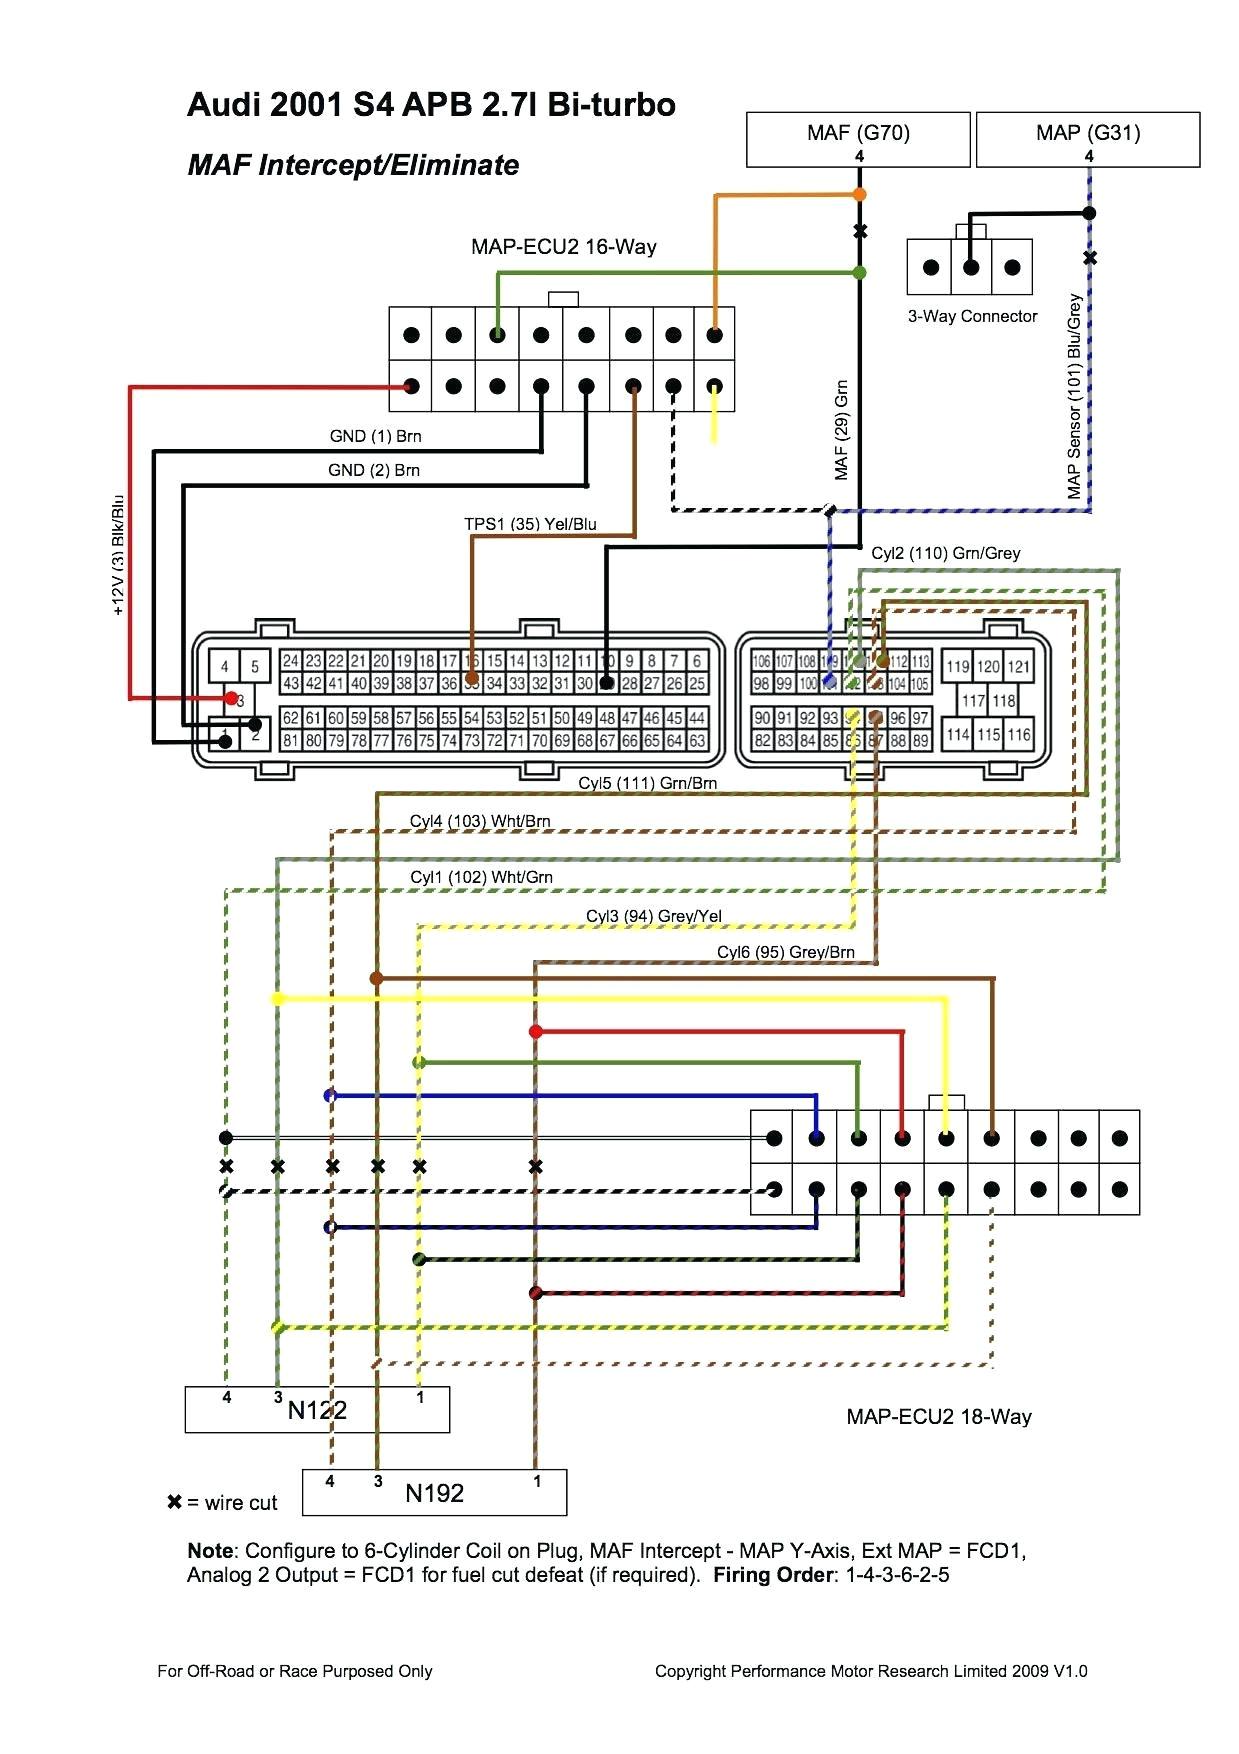 daihatsu l200 wiring diagram wiring diagram mega mitsubishi l200 wiring diagram needed wiring diagrams long daihatsu